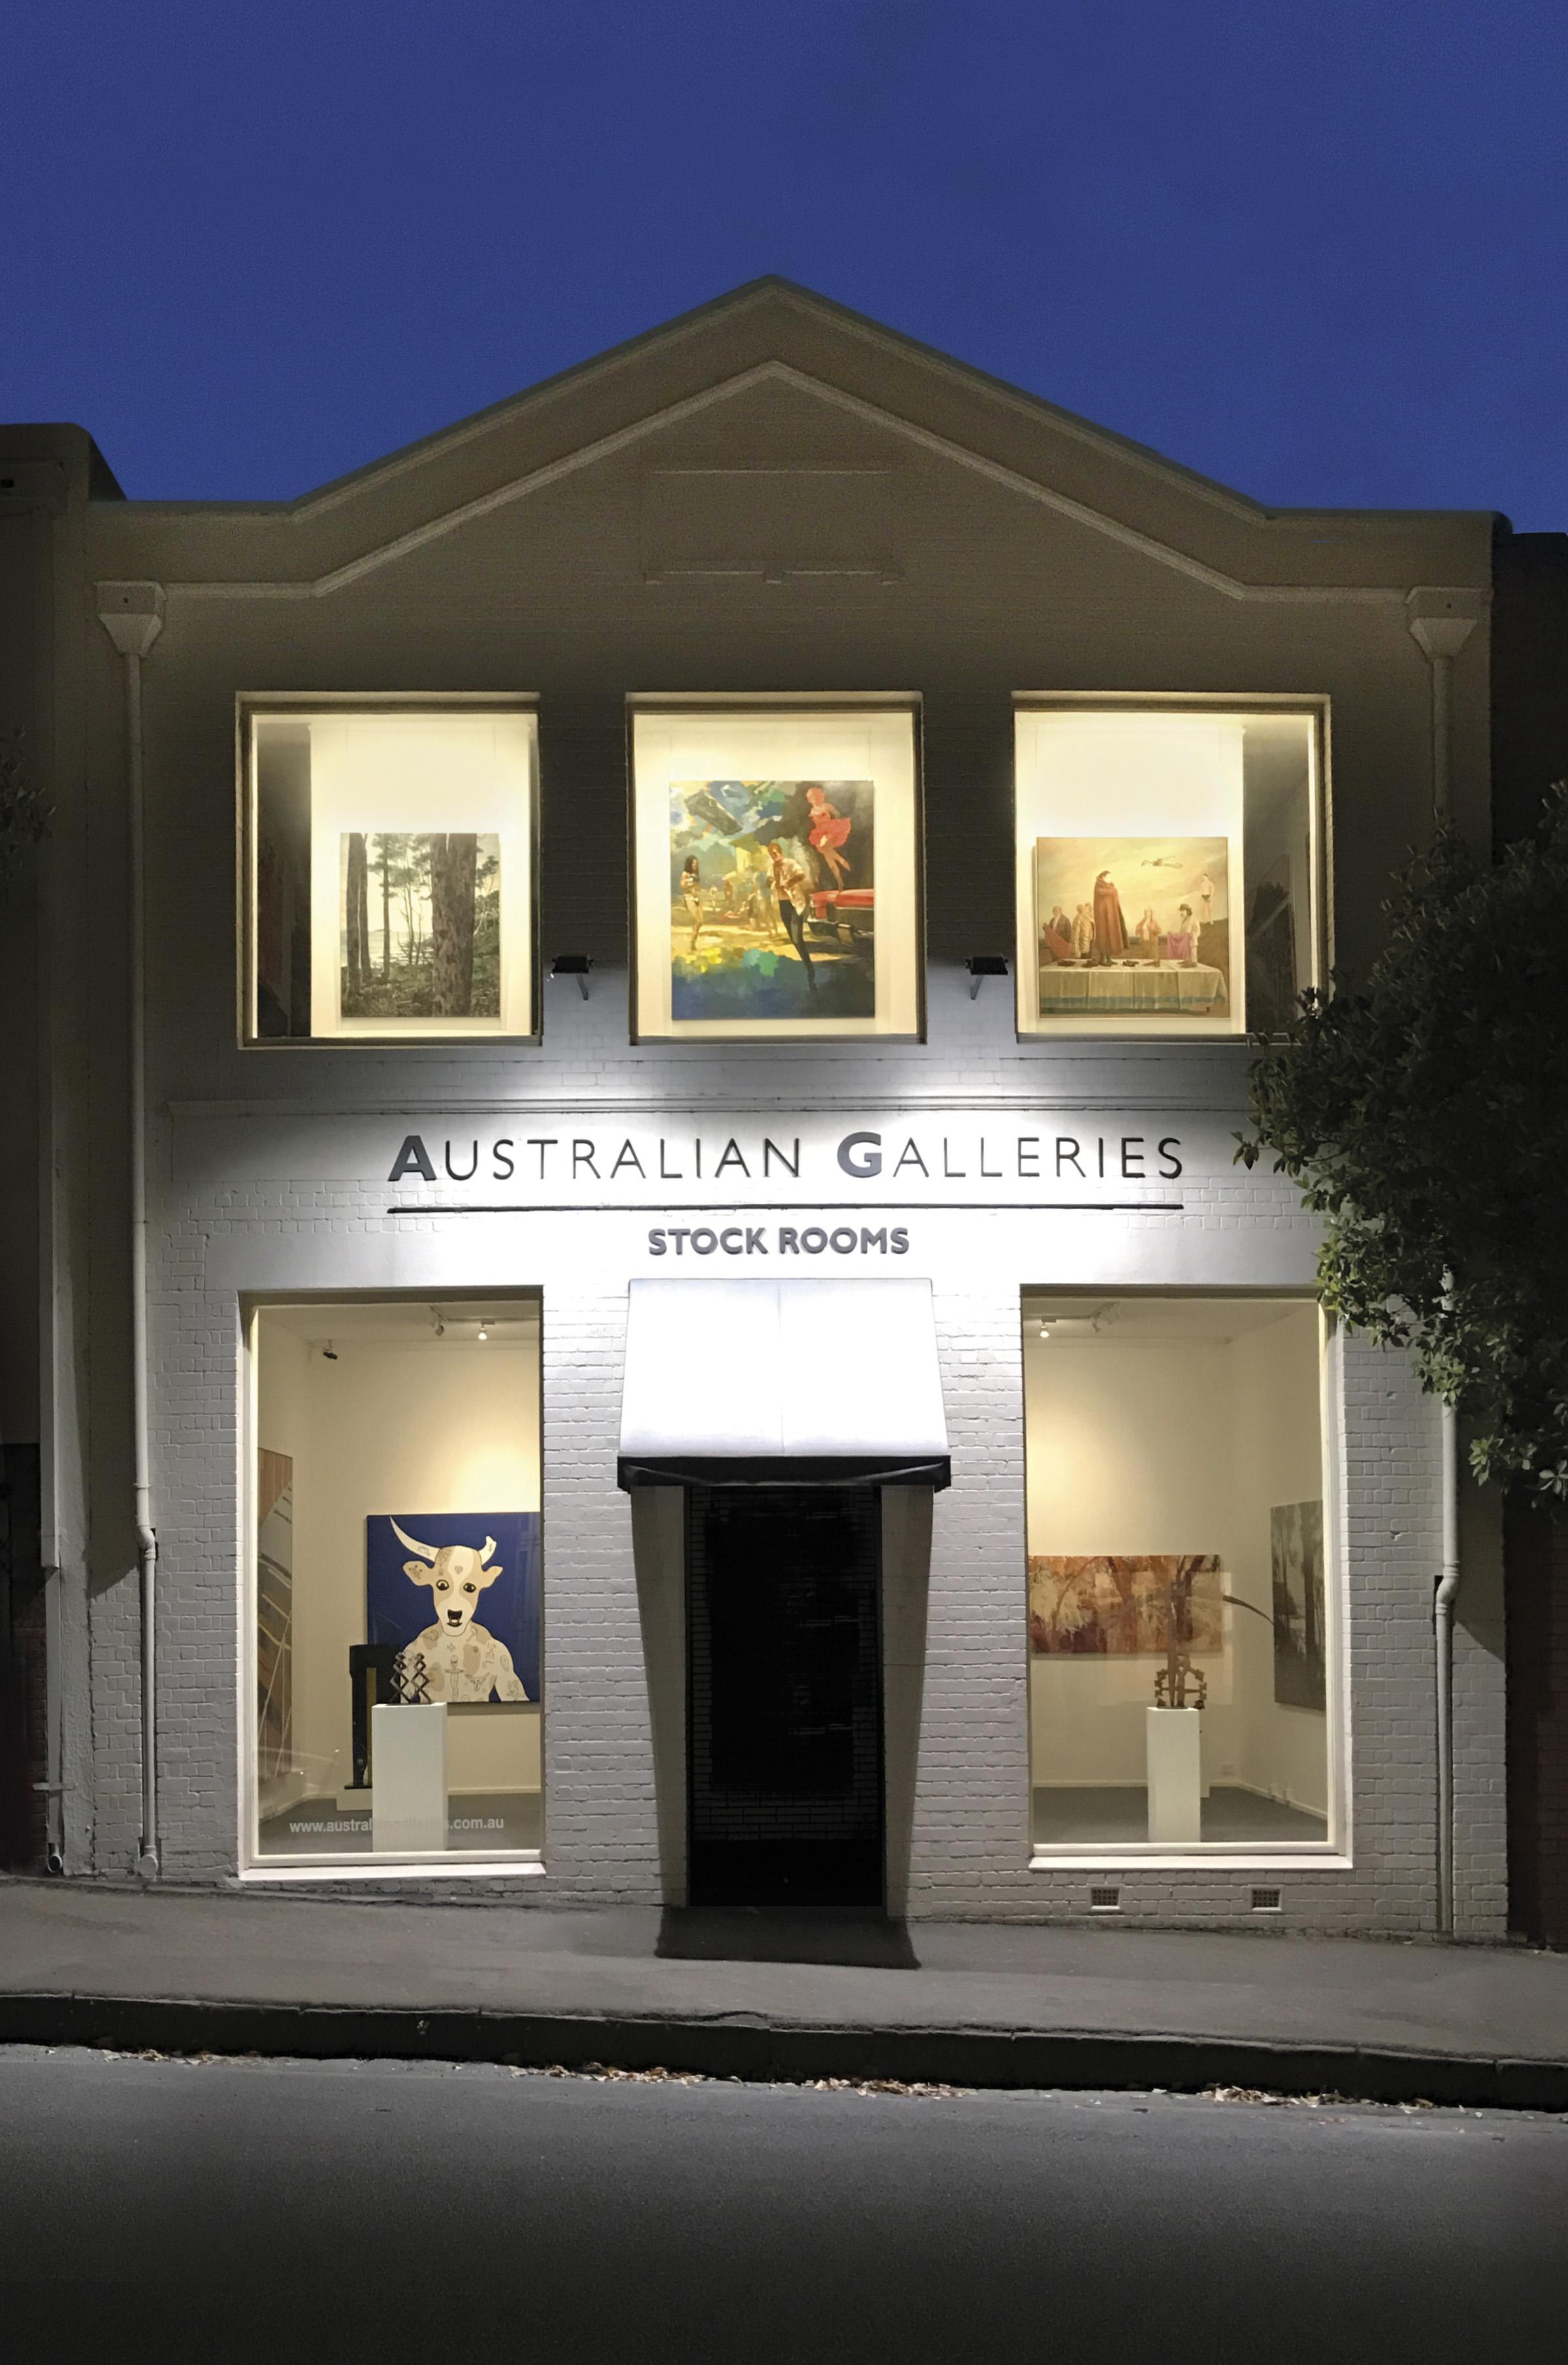 Australian Galleries Stock Rooms Exterior